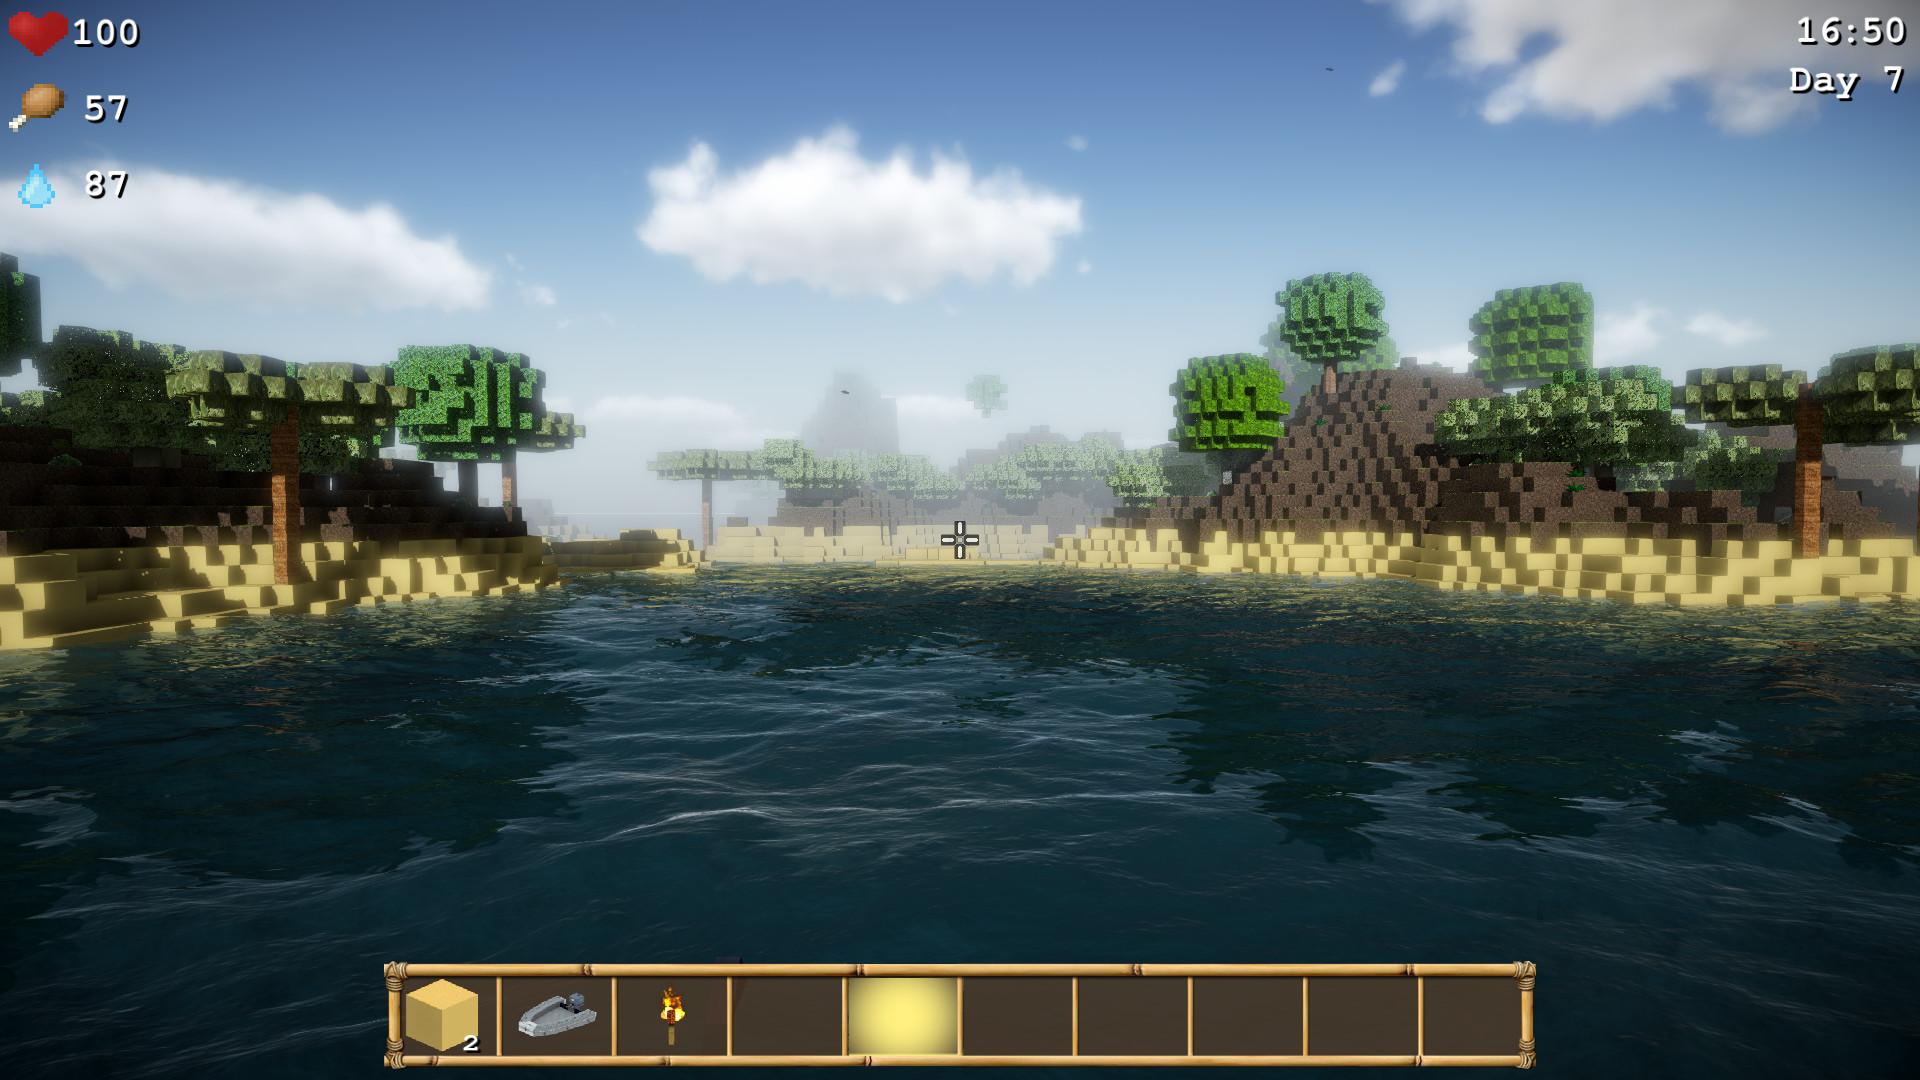 Скриншоты к Cube Life: Island Survival (2018) - полная версия